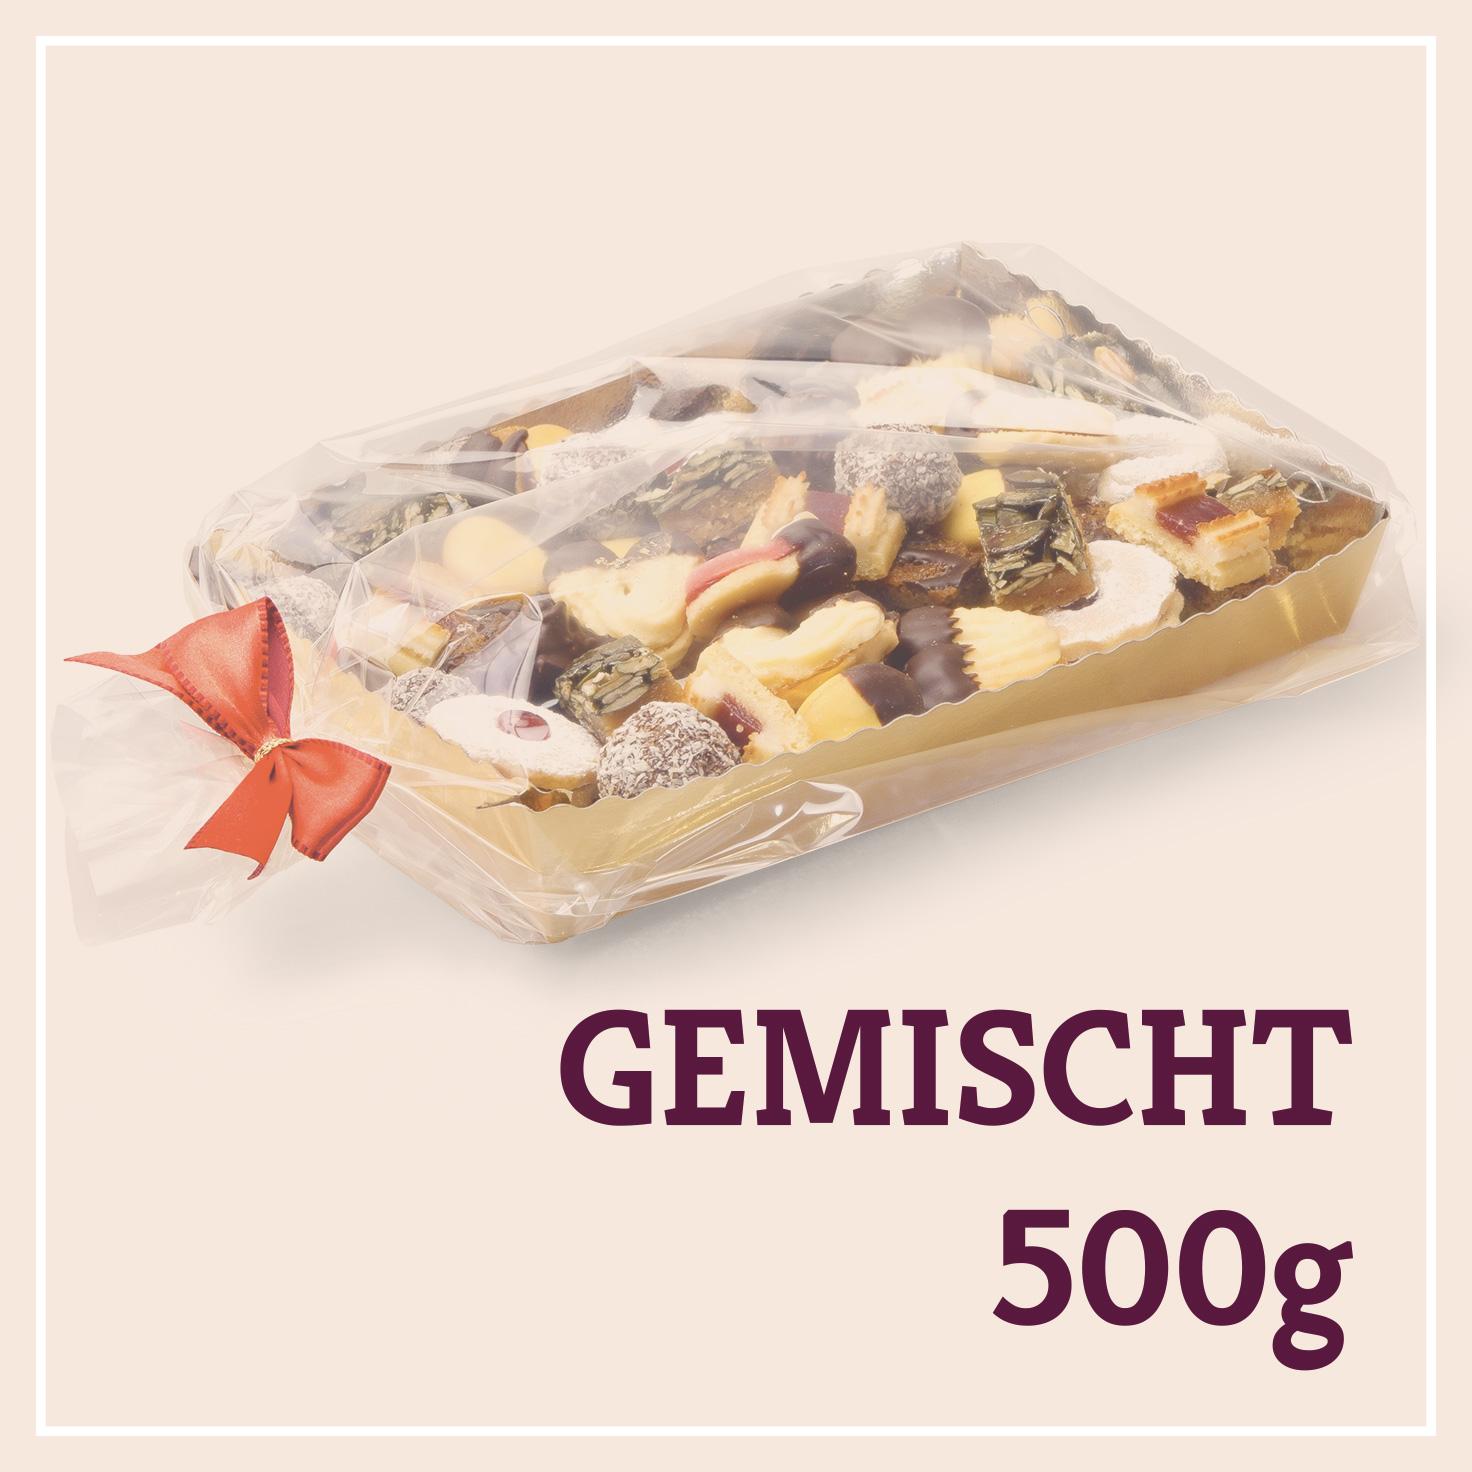 Heiss & Süß - Teebäckerei gemischt 500g in der Goldschale